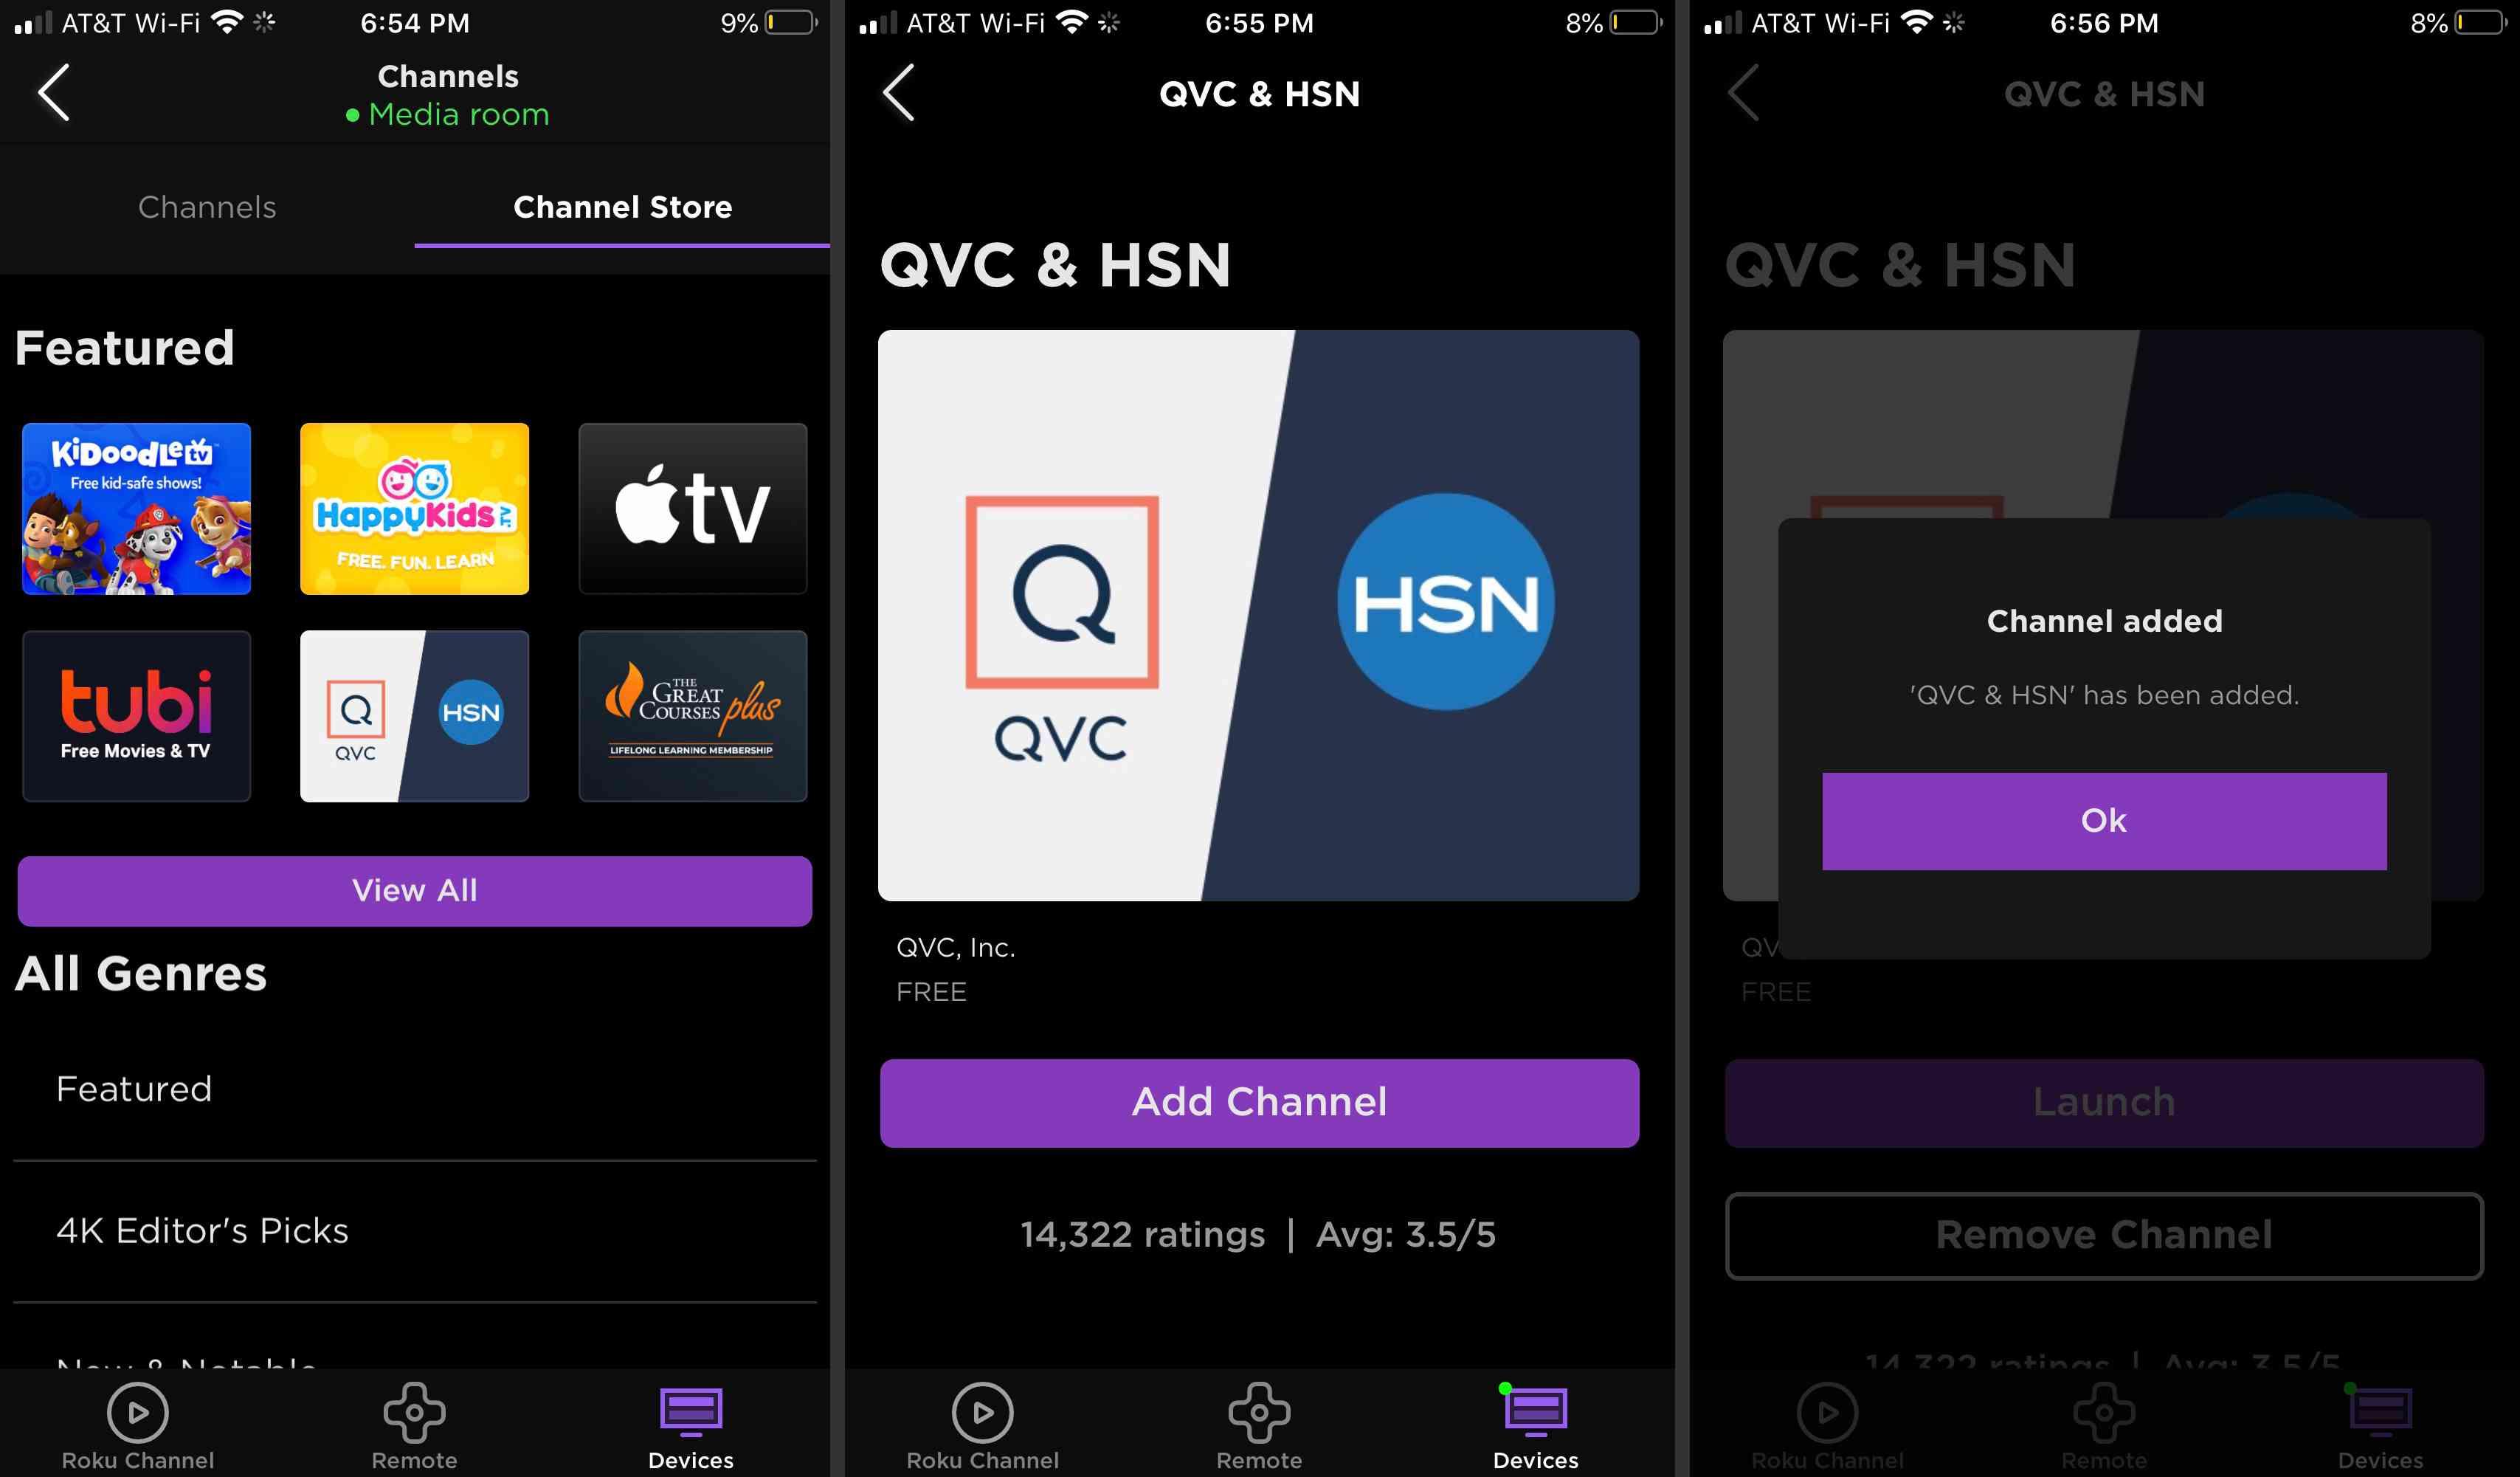 Add a channel to Roku via the Roku mobile app